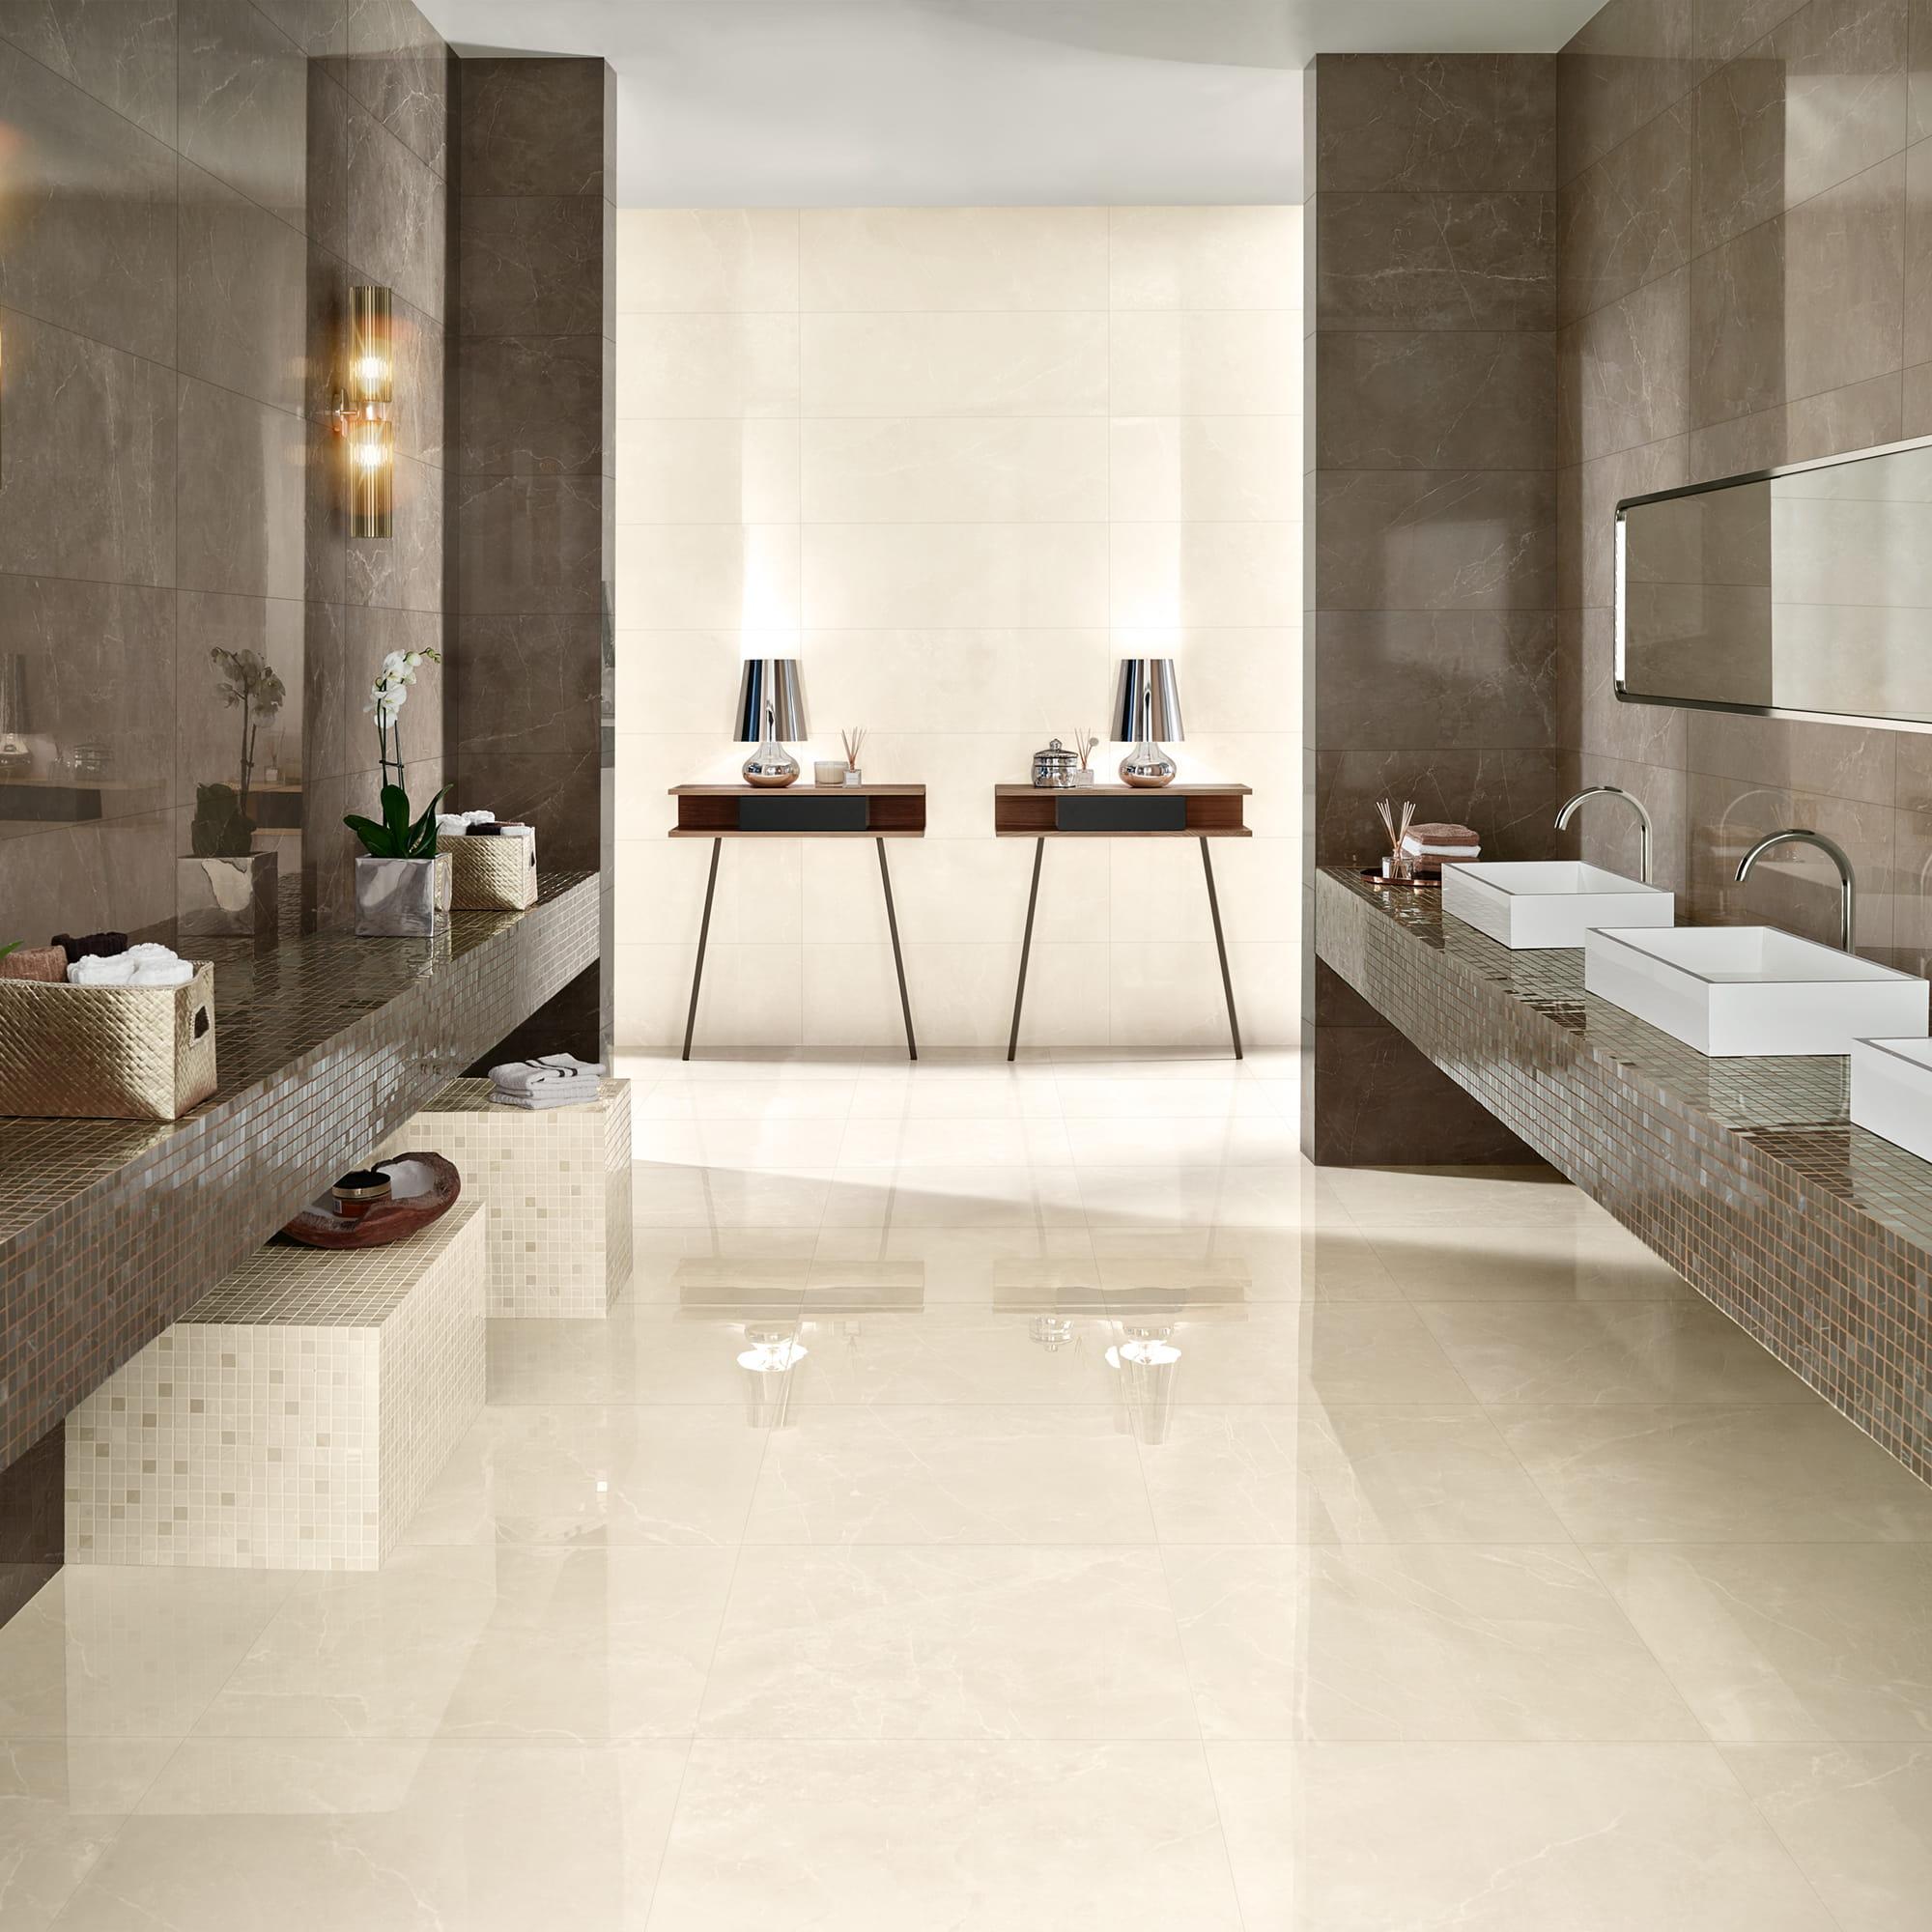 Marble Tortora Shine - 35 x 100 RET. | Marble Cream Shine - 35 x 100 RET. | Mosaic Marble Tortora Shine - 17 x 17 | Mosaic Marble Cream Shine - 17 x 17 | Marble Cream Pol. - 60 x 60 RET.